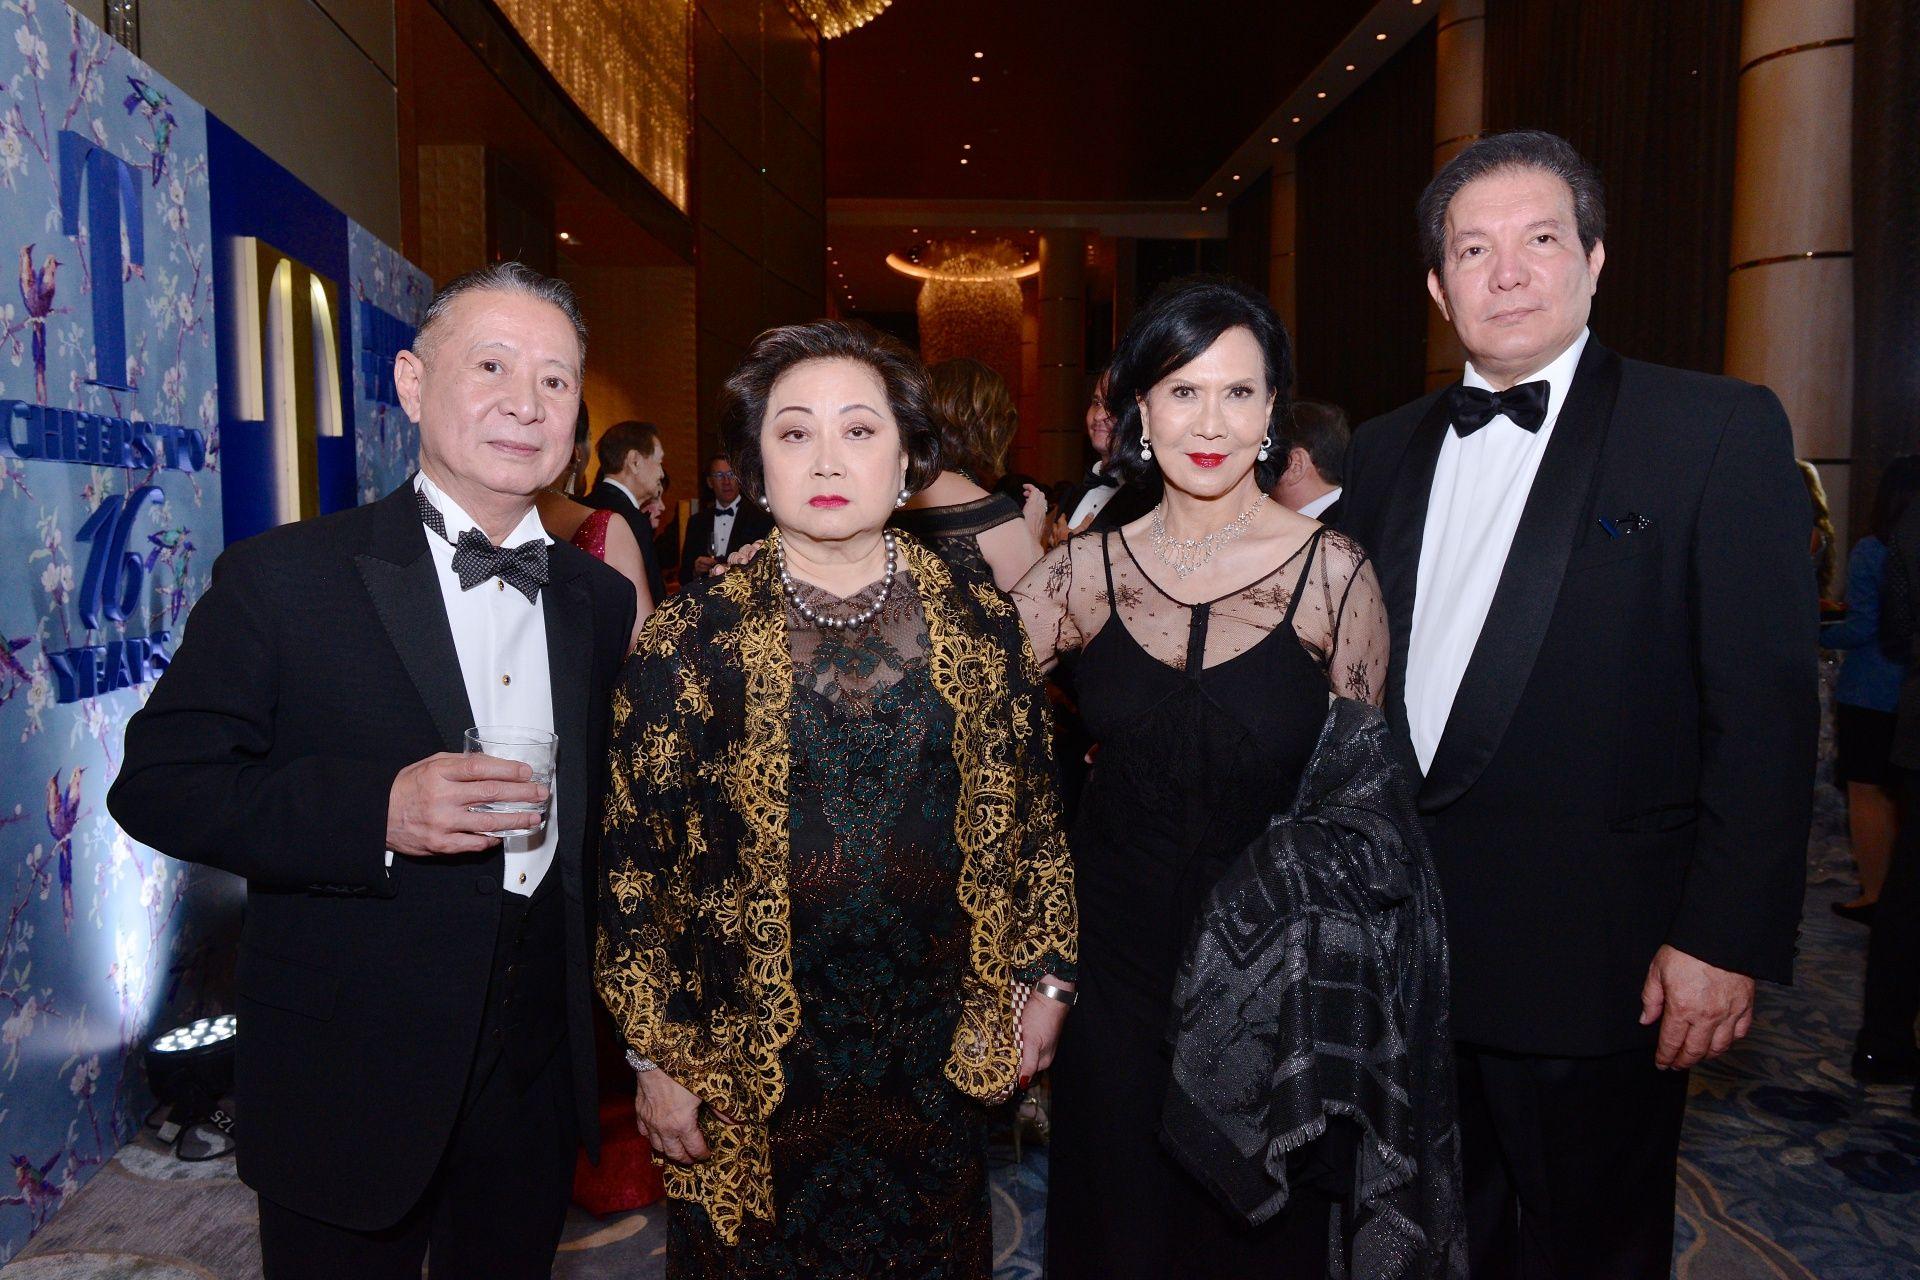 Mario Katigbak, Nedy Tantoco, Babette Aquino Benoit and Patrick Jacinto